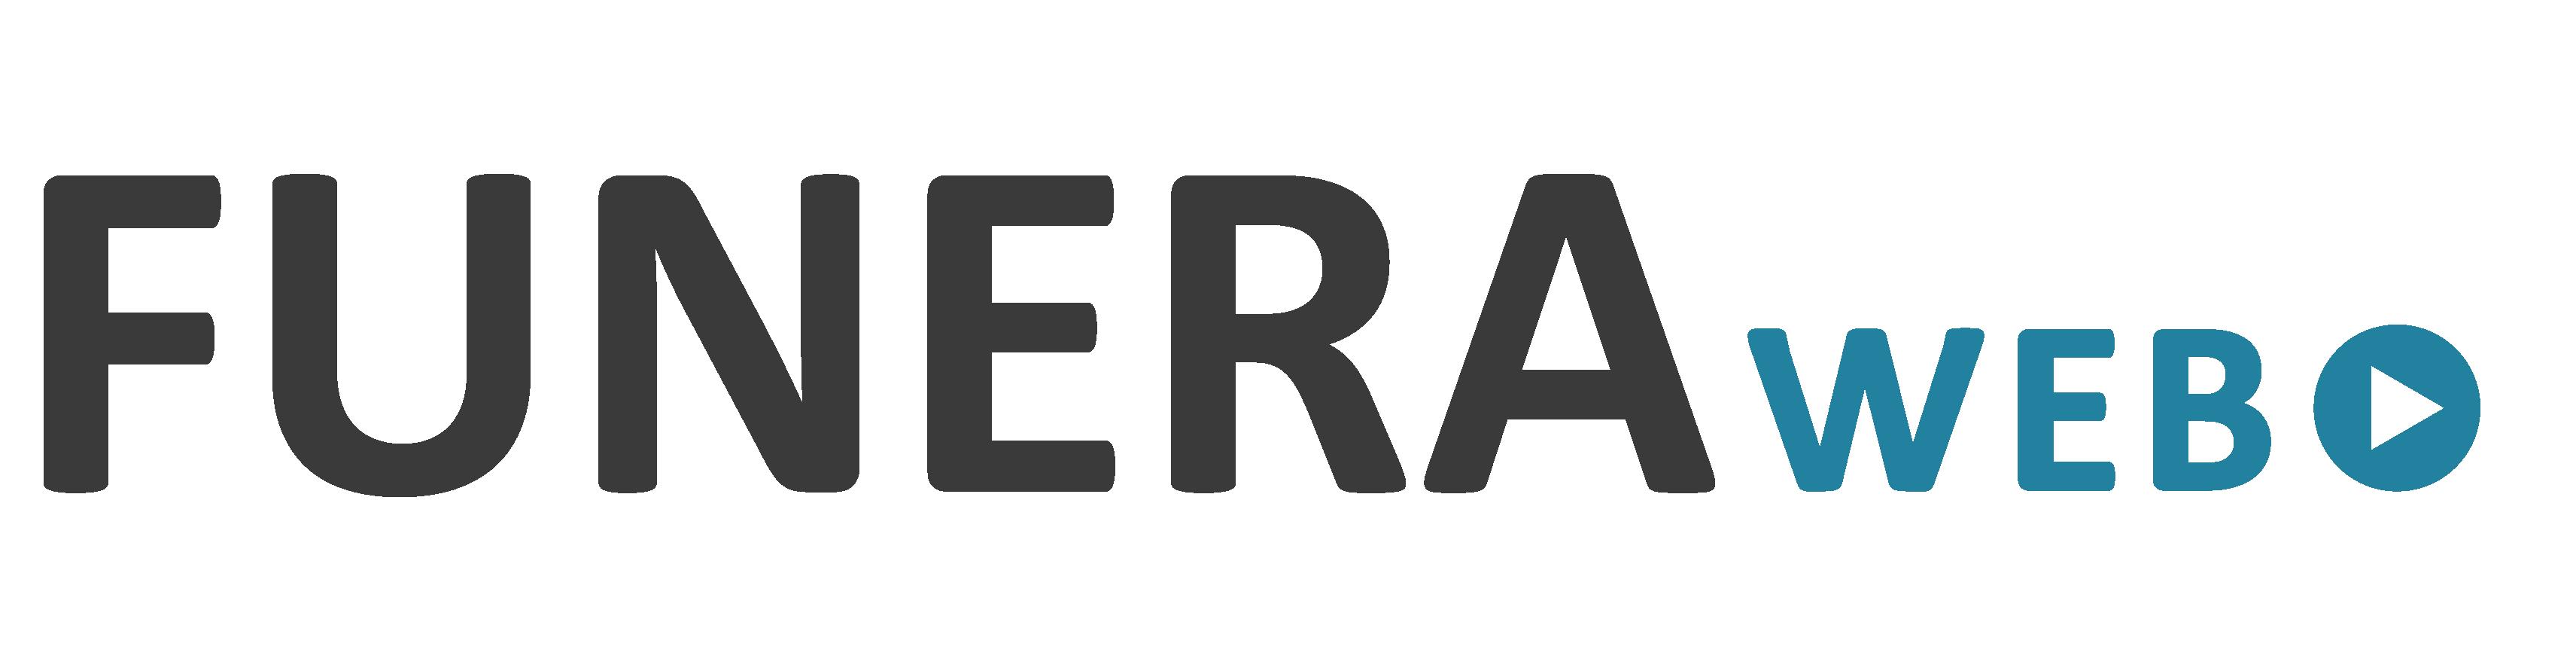 Funeraweb.tv